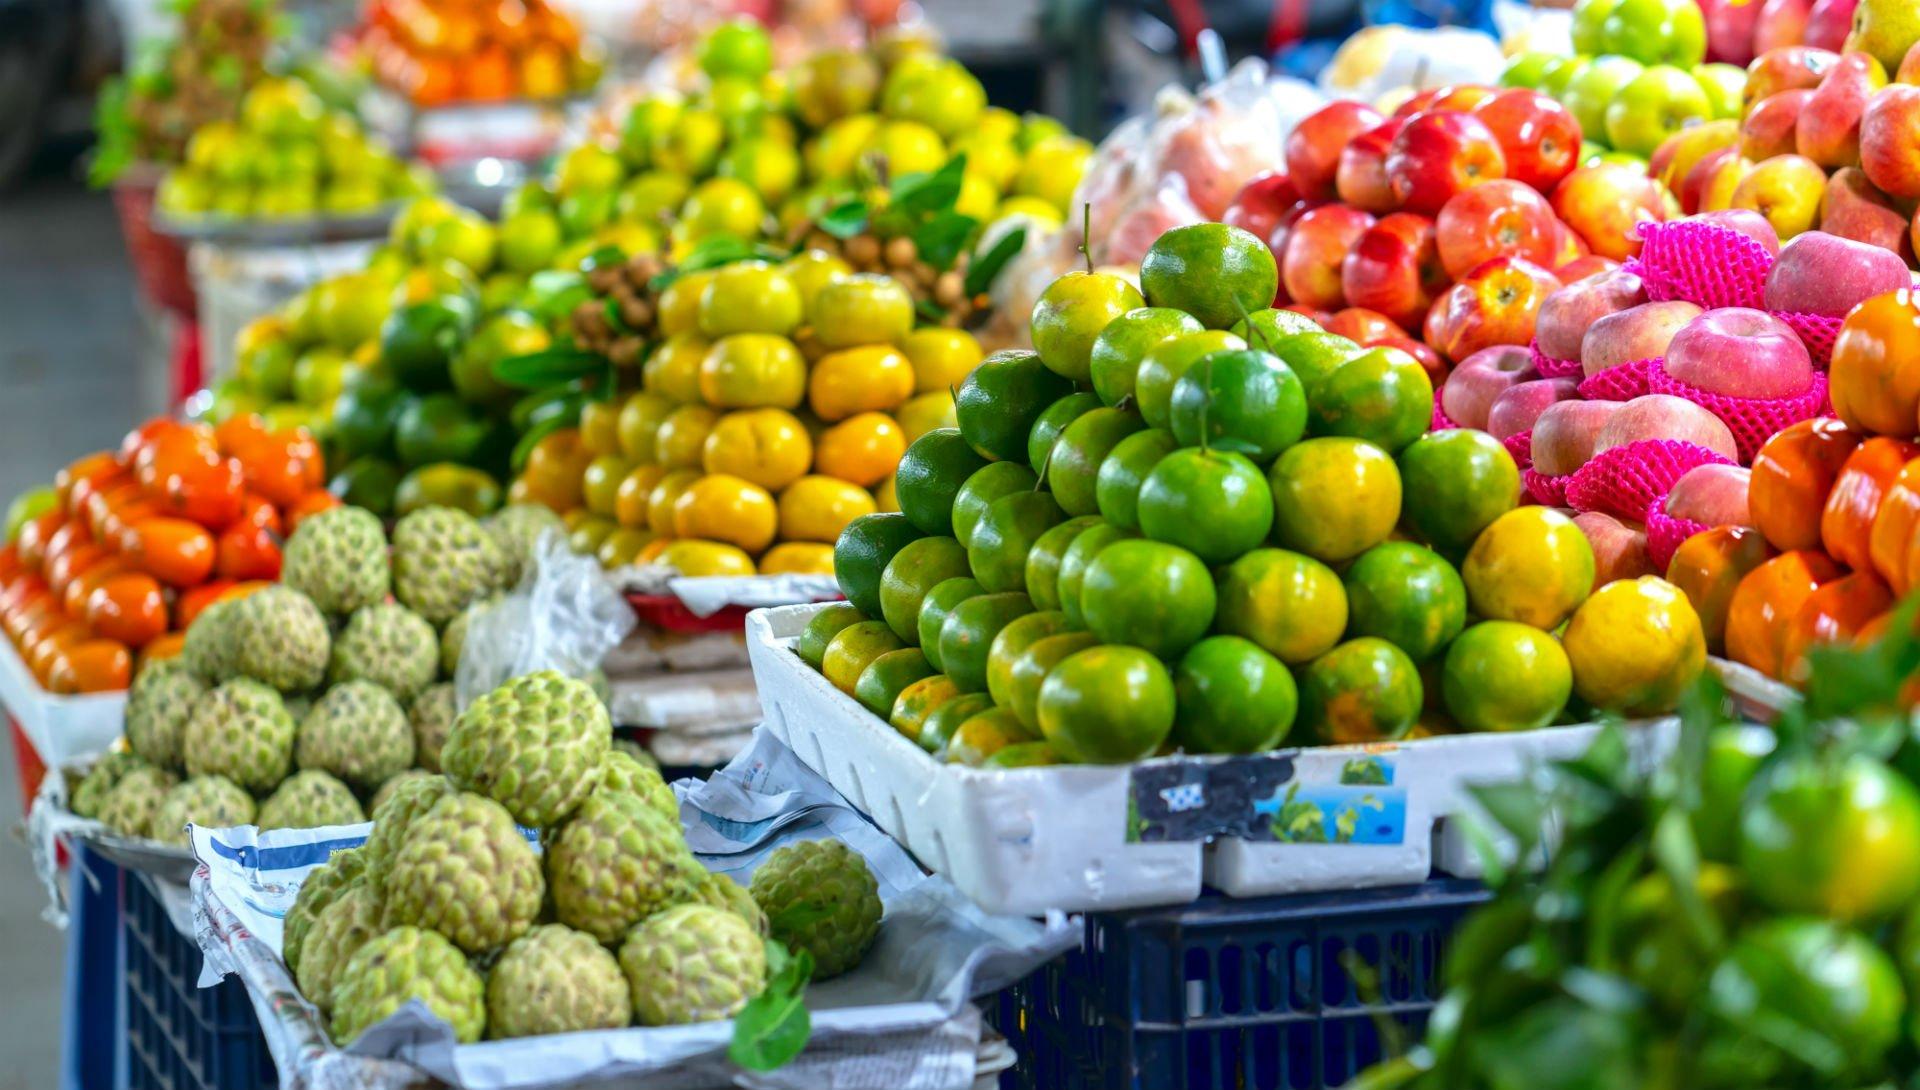 vendita di frutta e verdura, frutta esotica